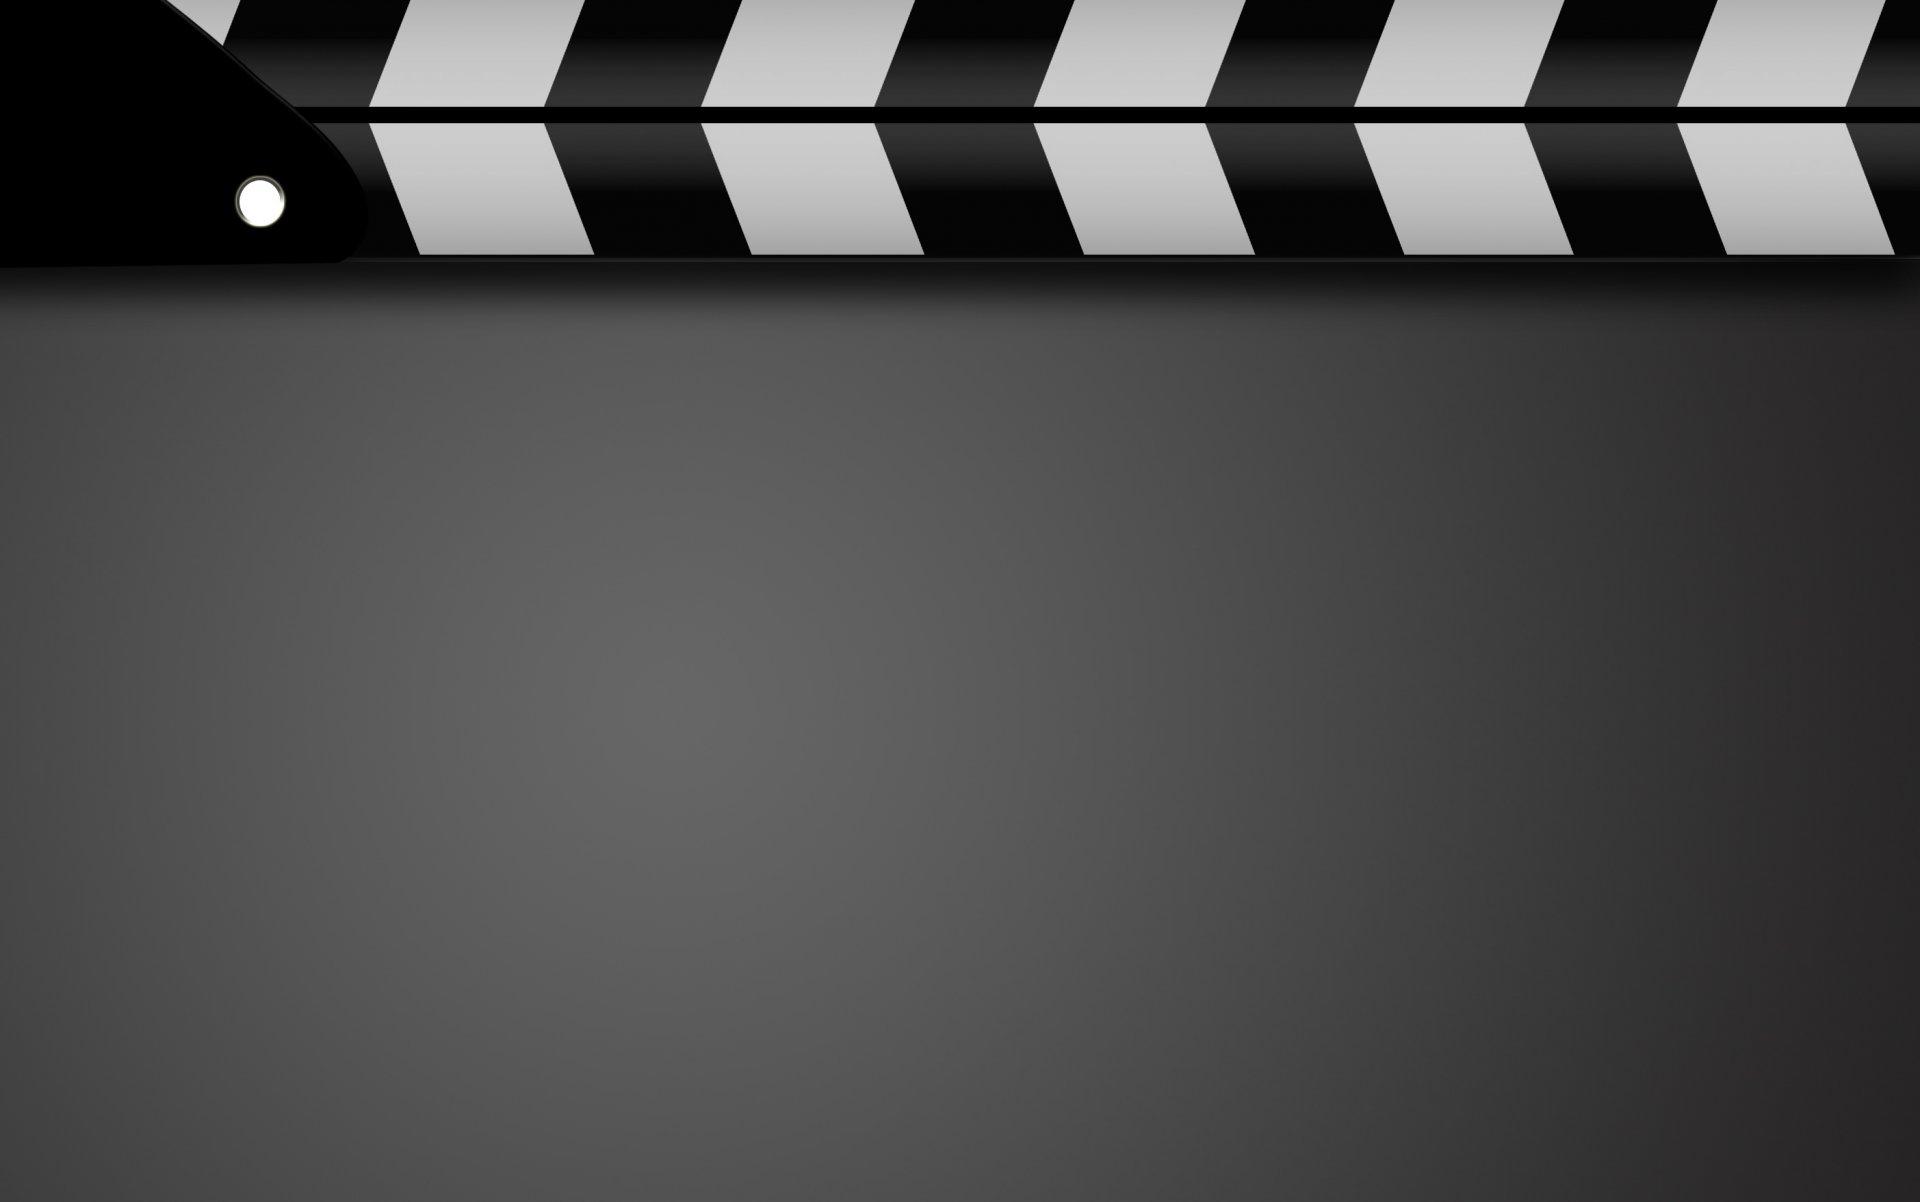 шаблон для постера кино